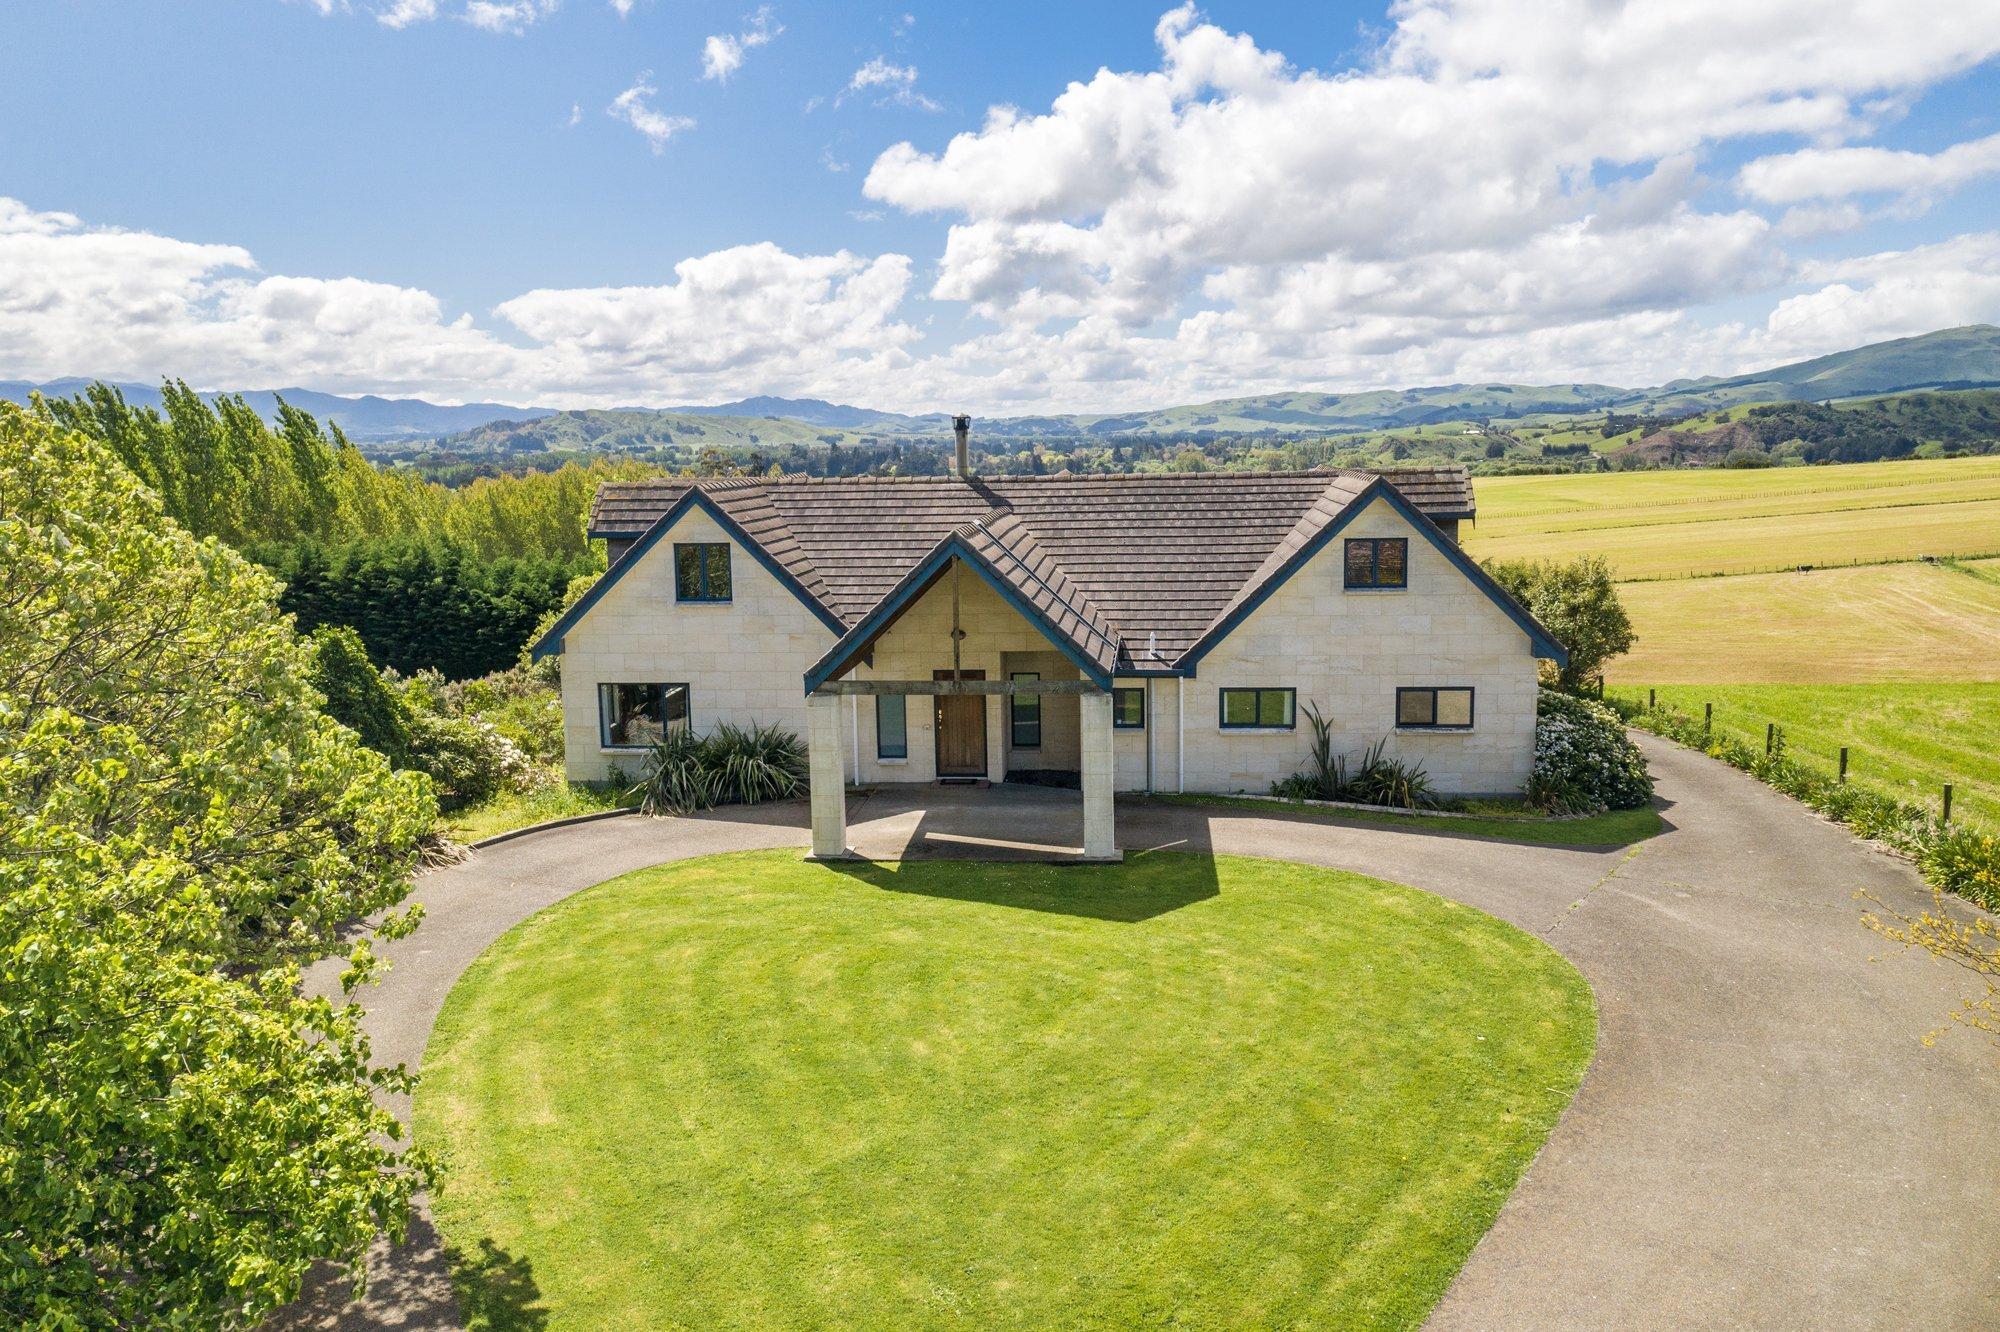 House in Lansdowne, Wellington, New Zealand 1